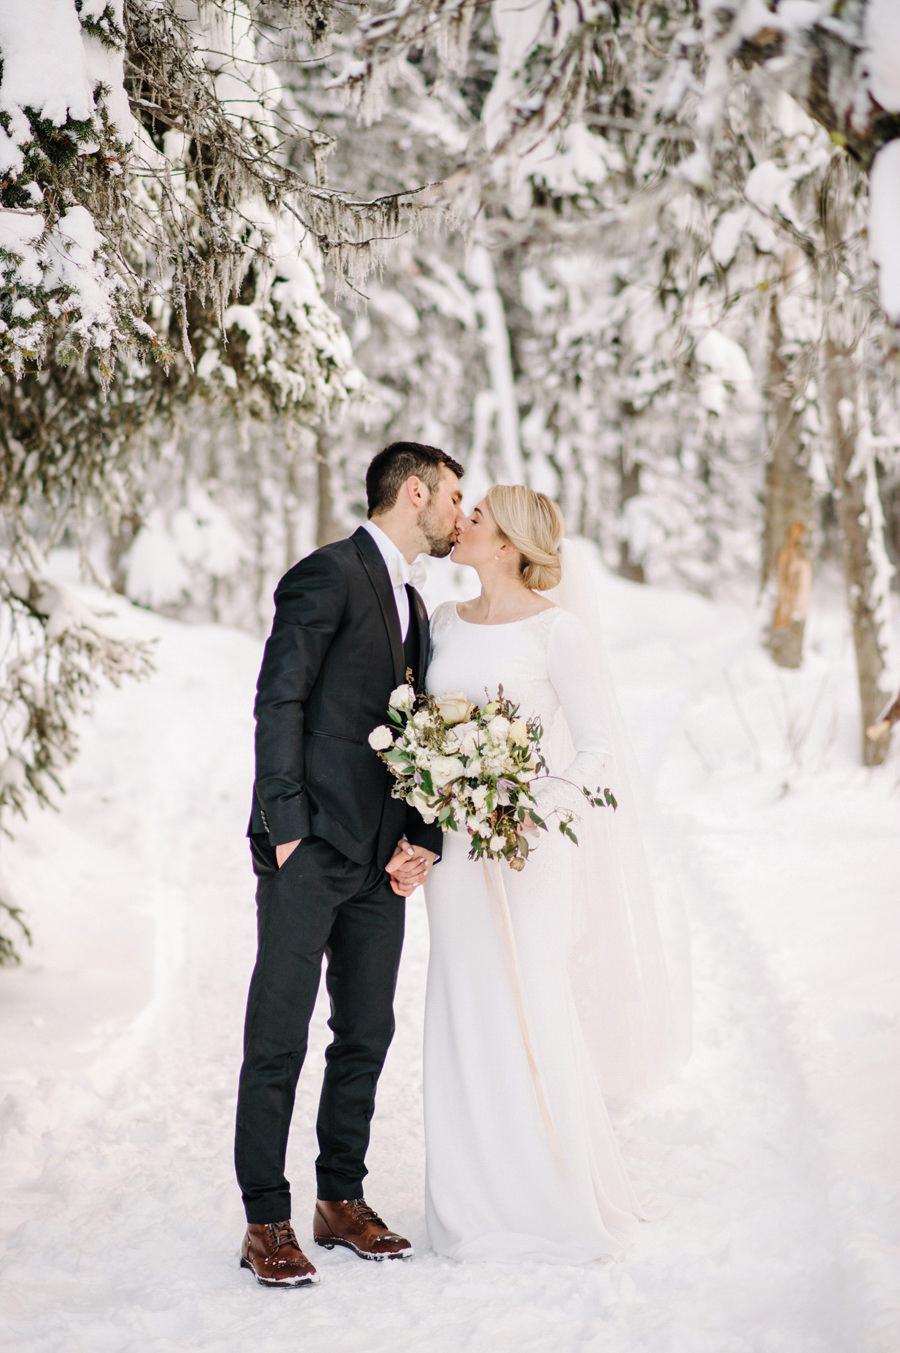 winter_wedding_fairmont_chateau_lake_louise_024.jpg